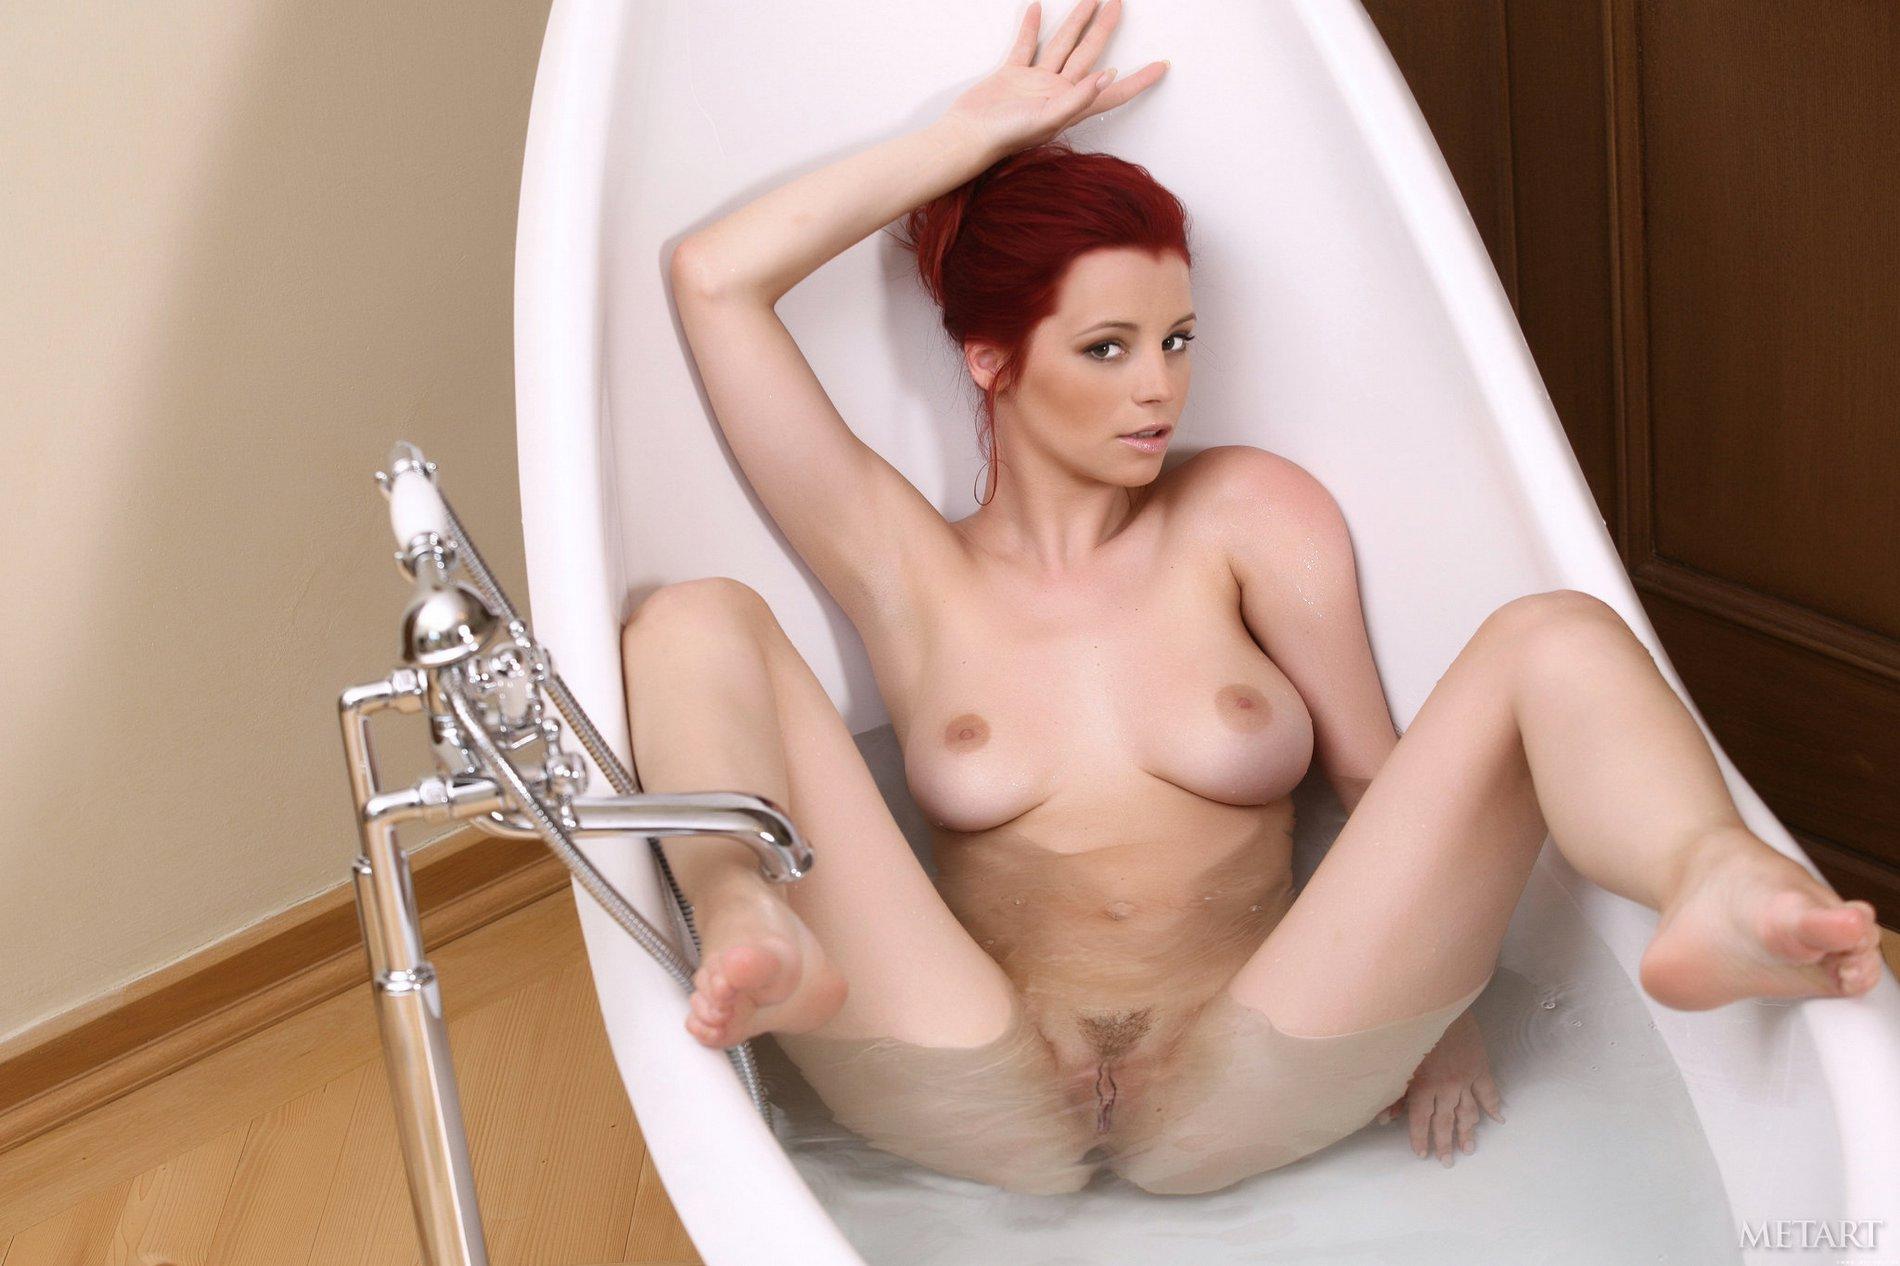 Ariel redhead hardcore great looking